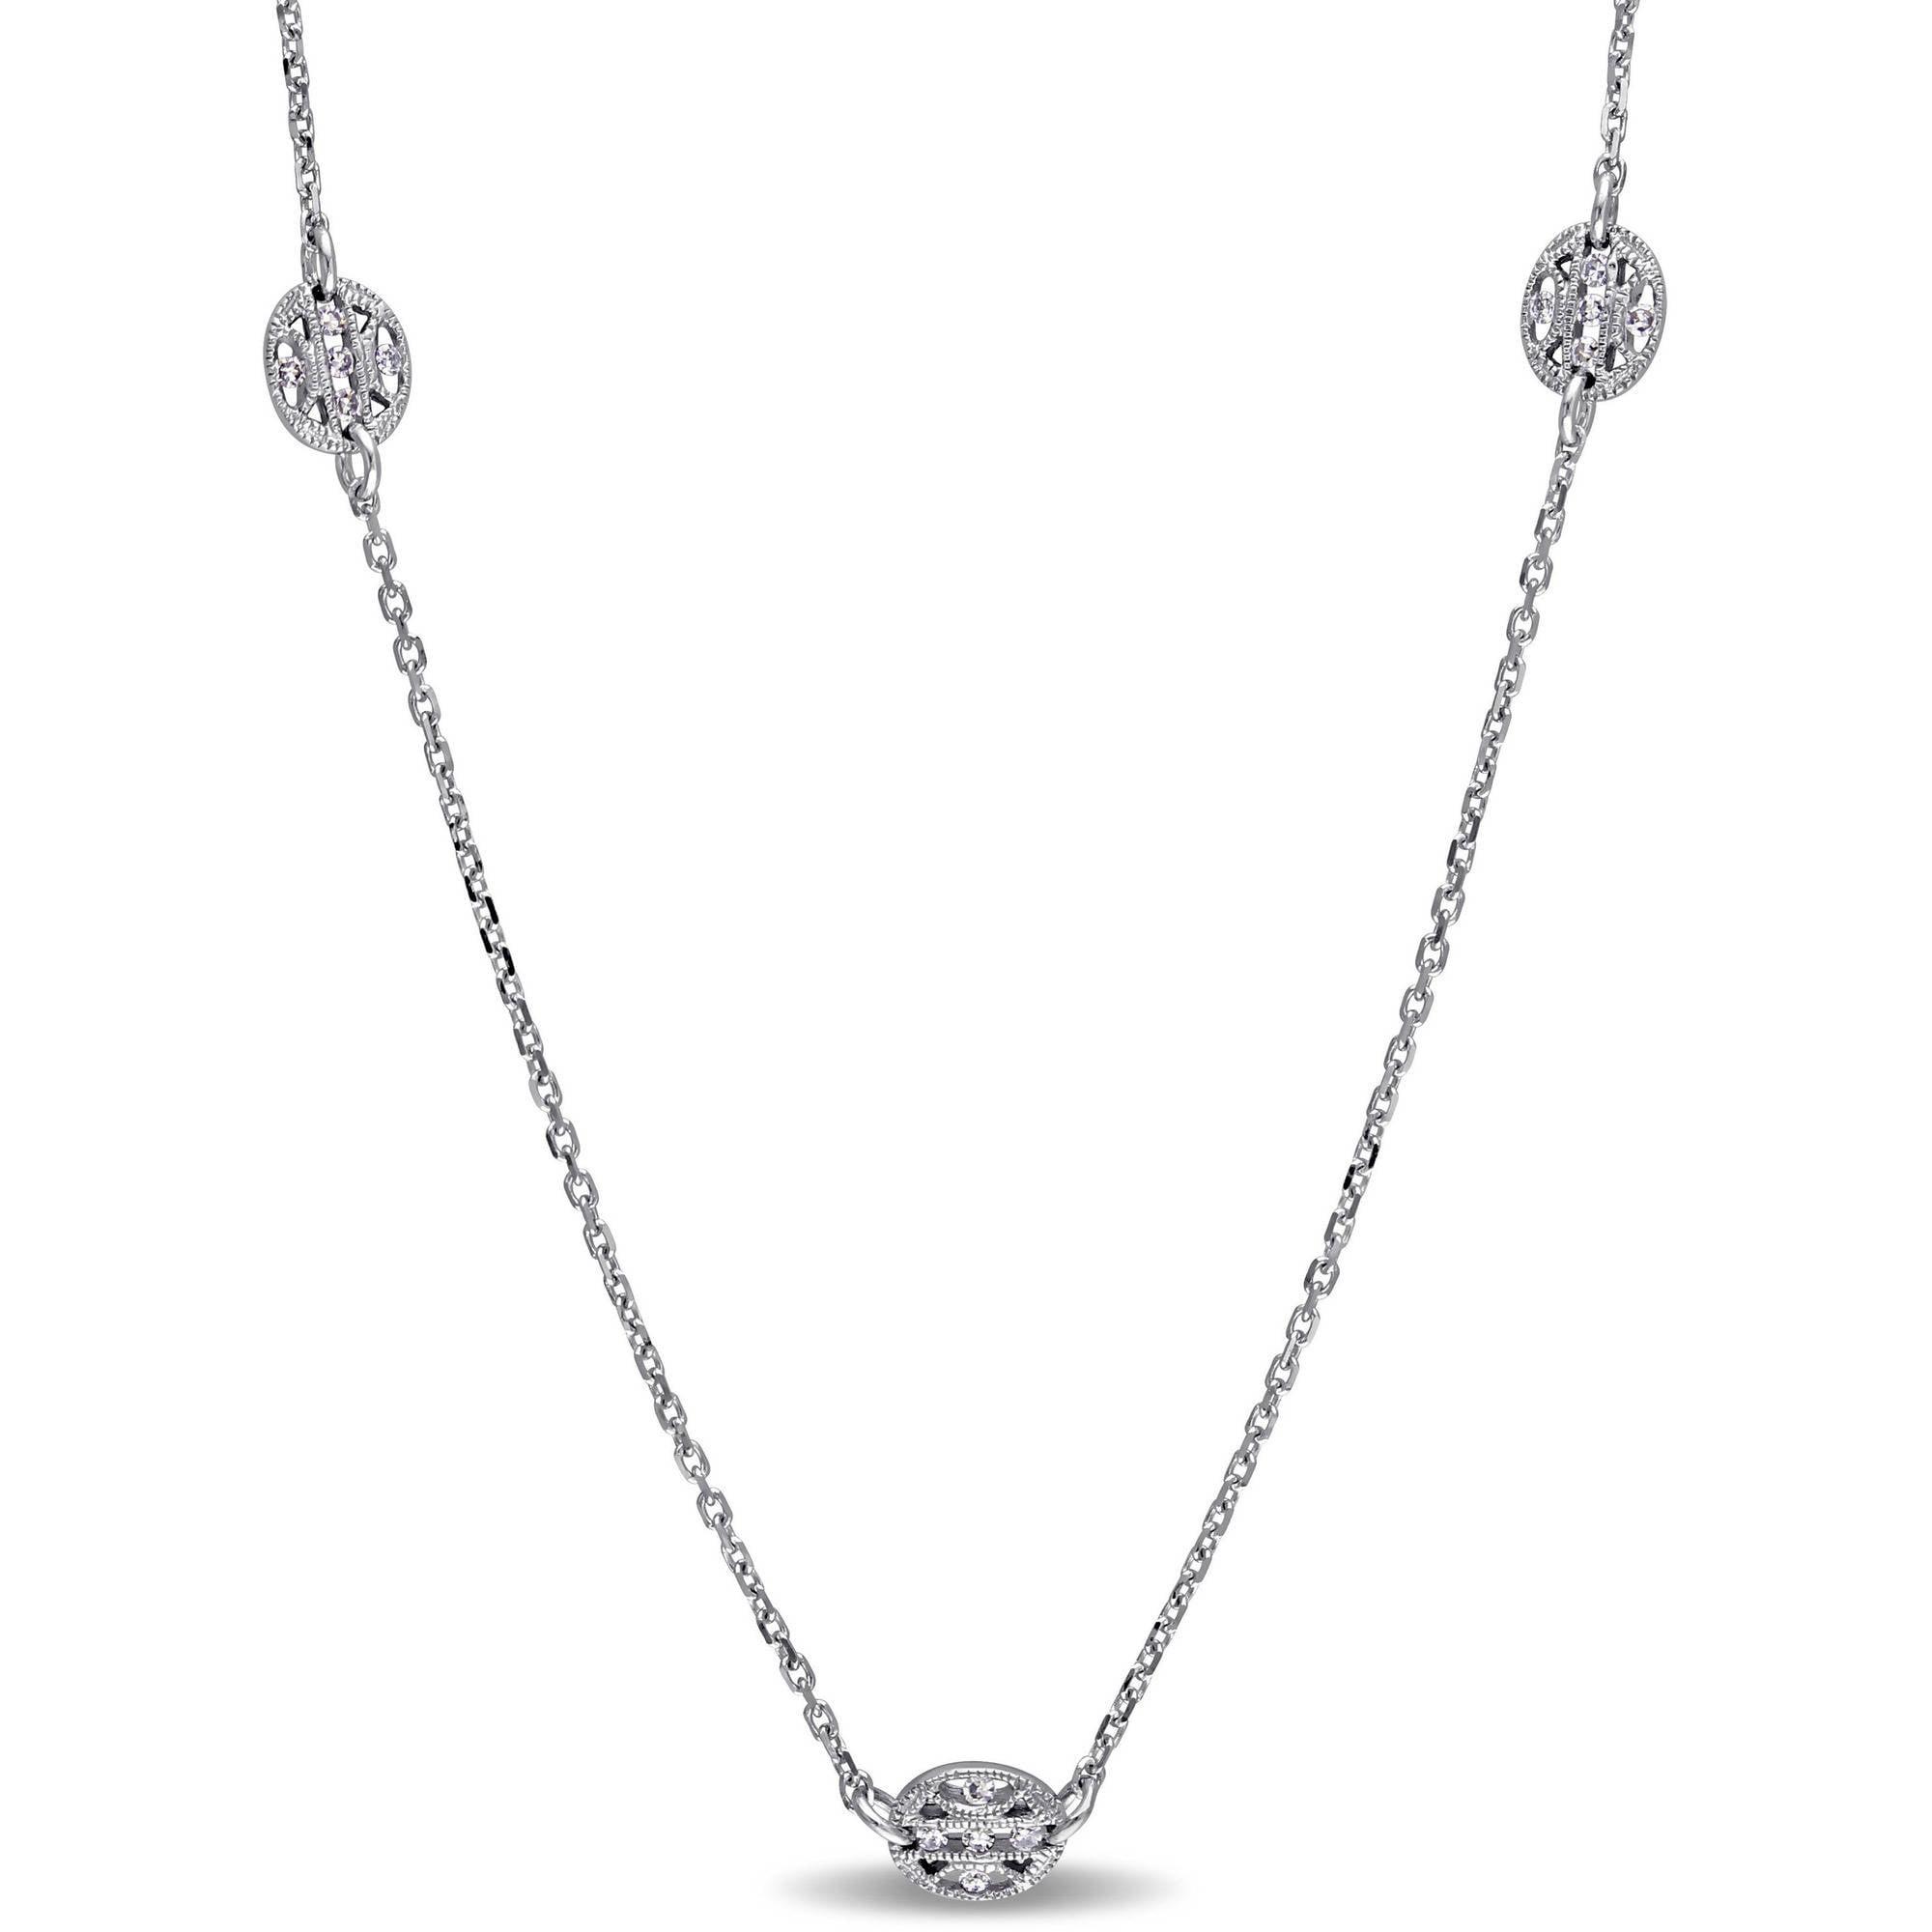 "Miabella 1 3 Carat T.W. Diamond 14kt White Gold Vintage Station Necklace, 32"" by Miabella"